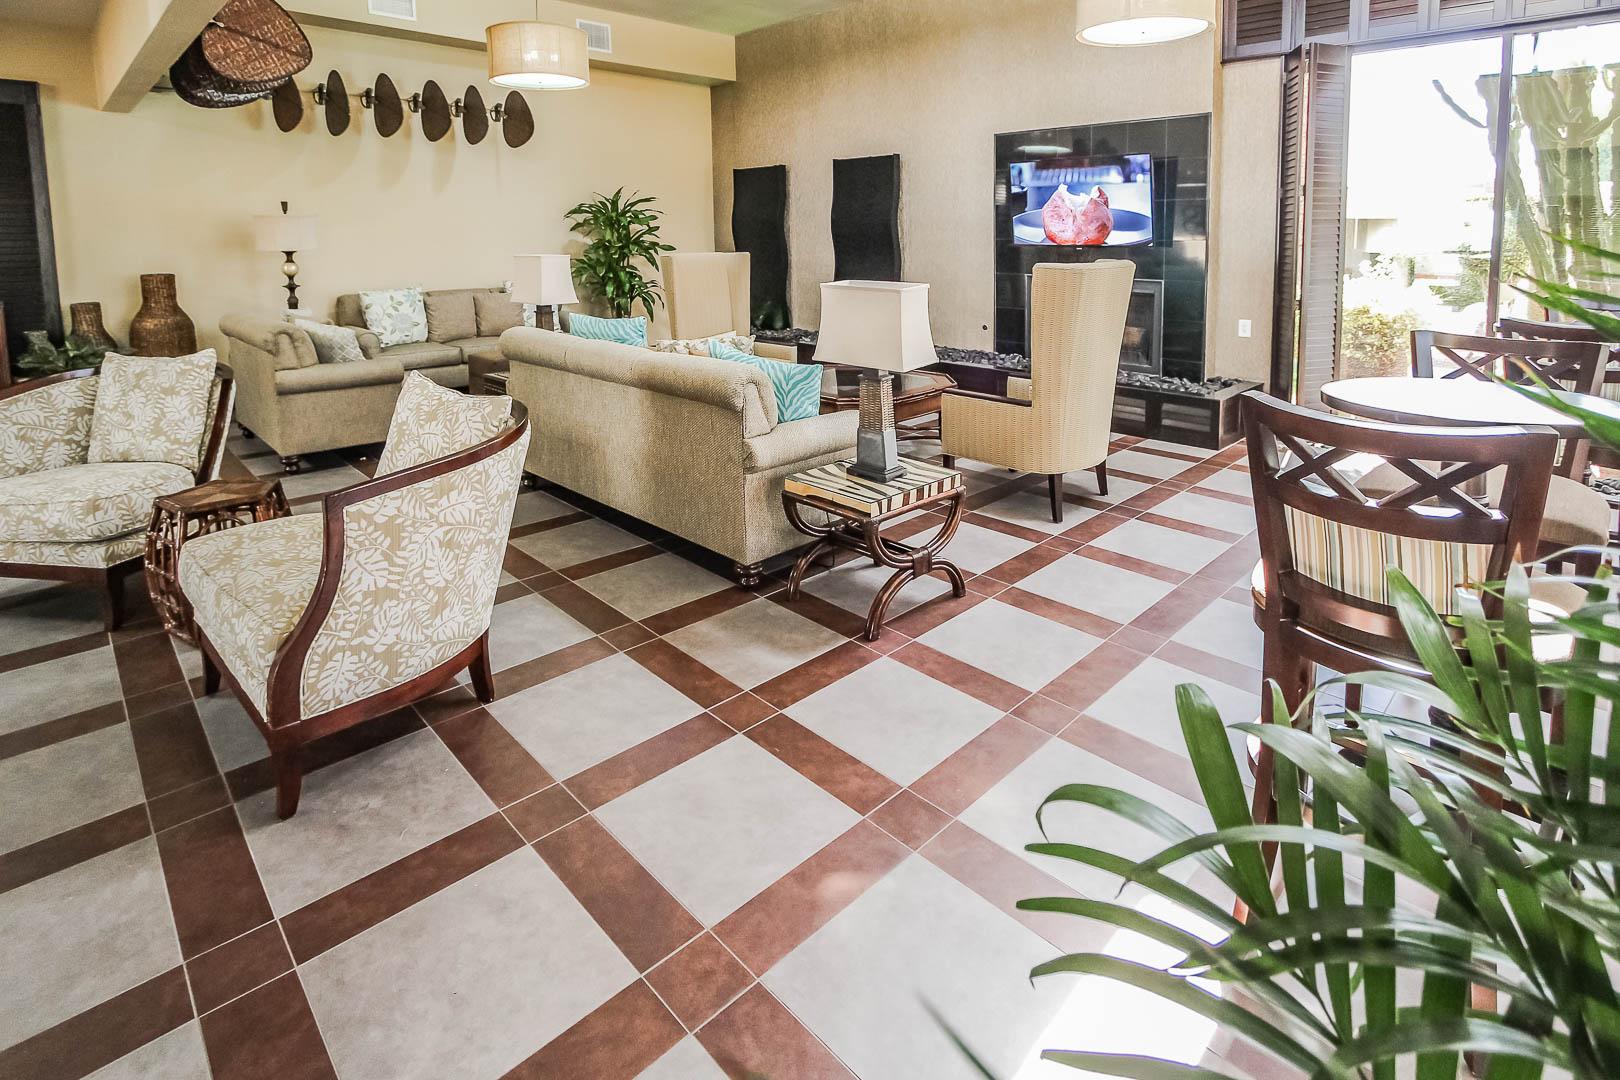 A refreshing lobby area at VRI's Desert Isle Resort in California.